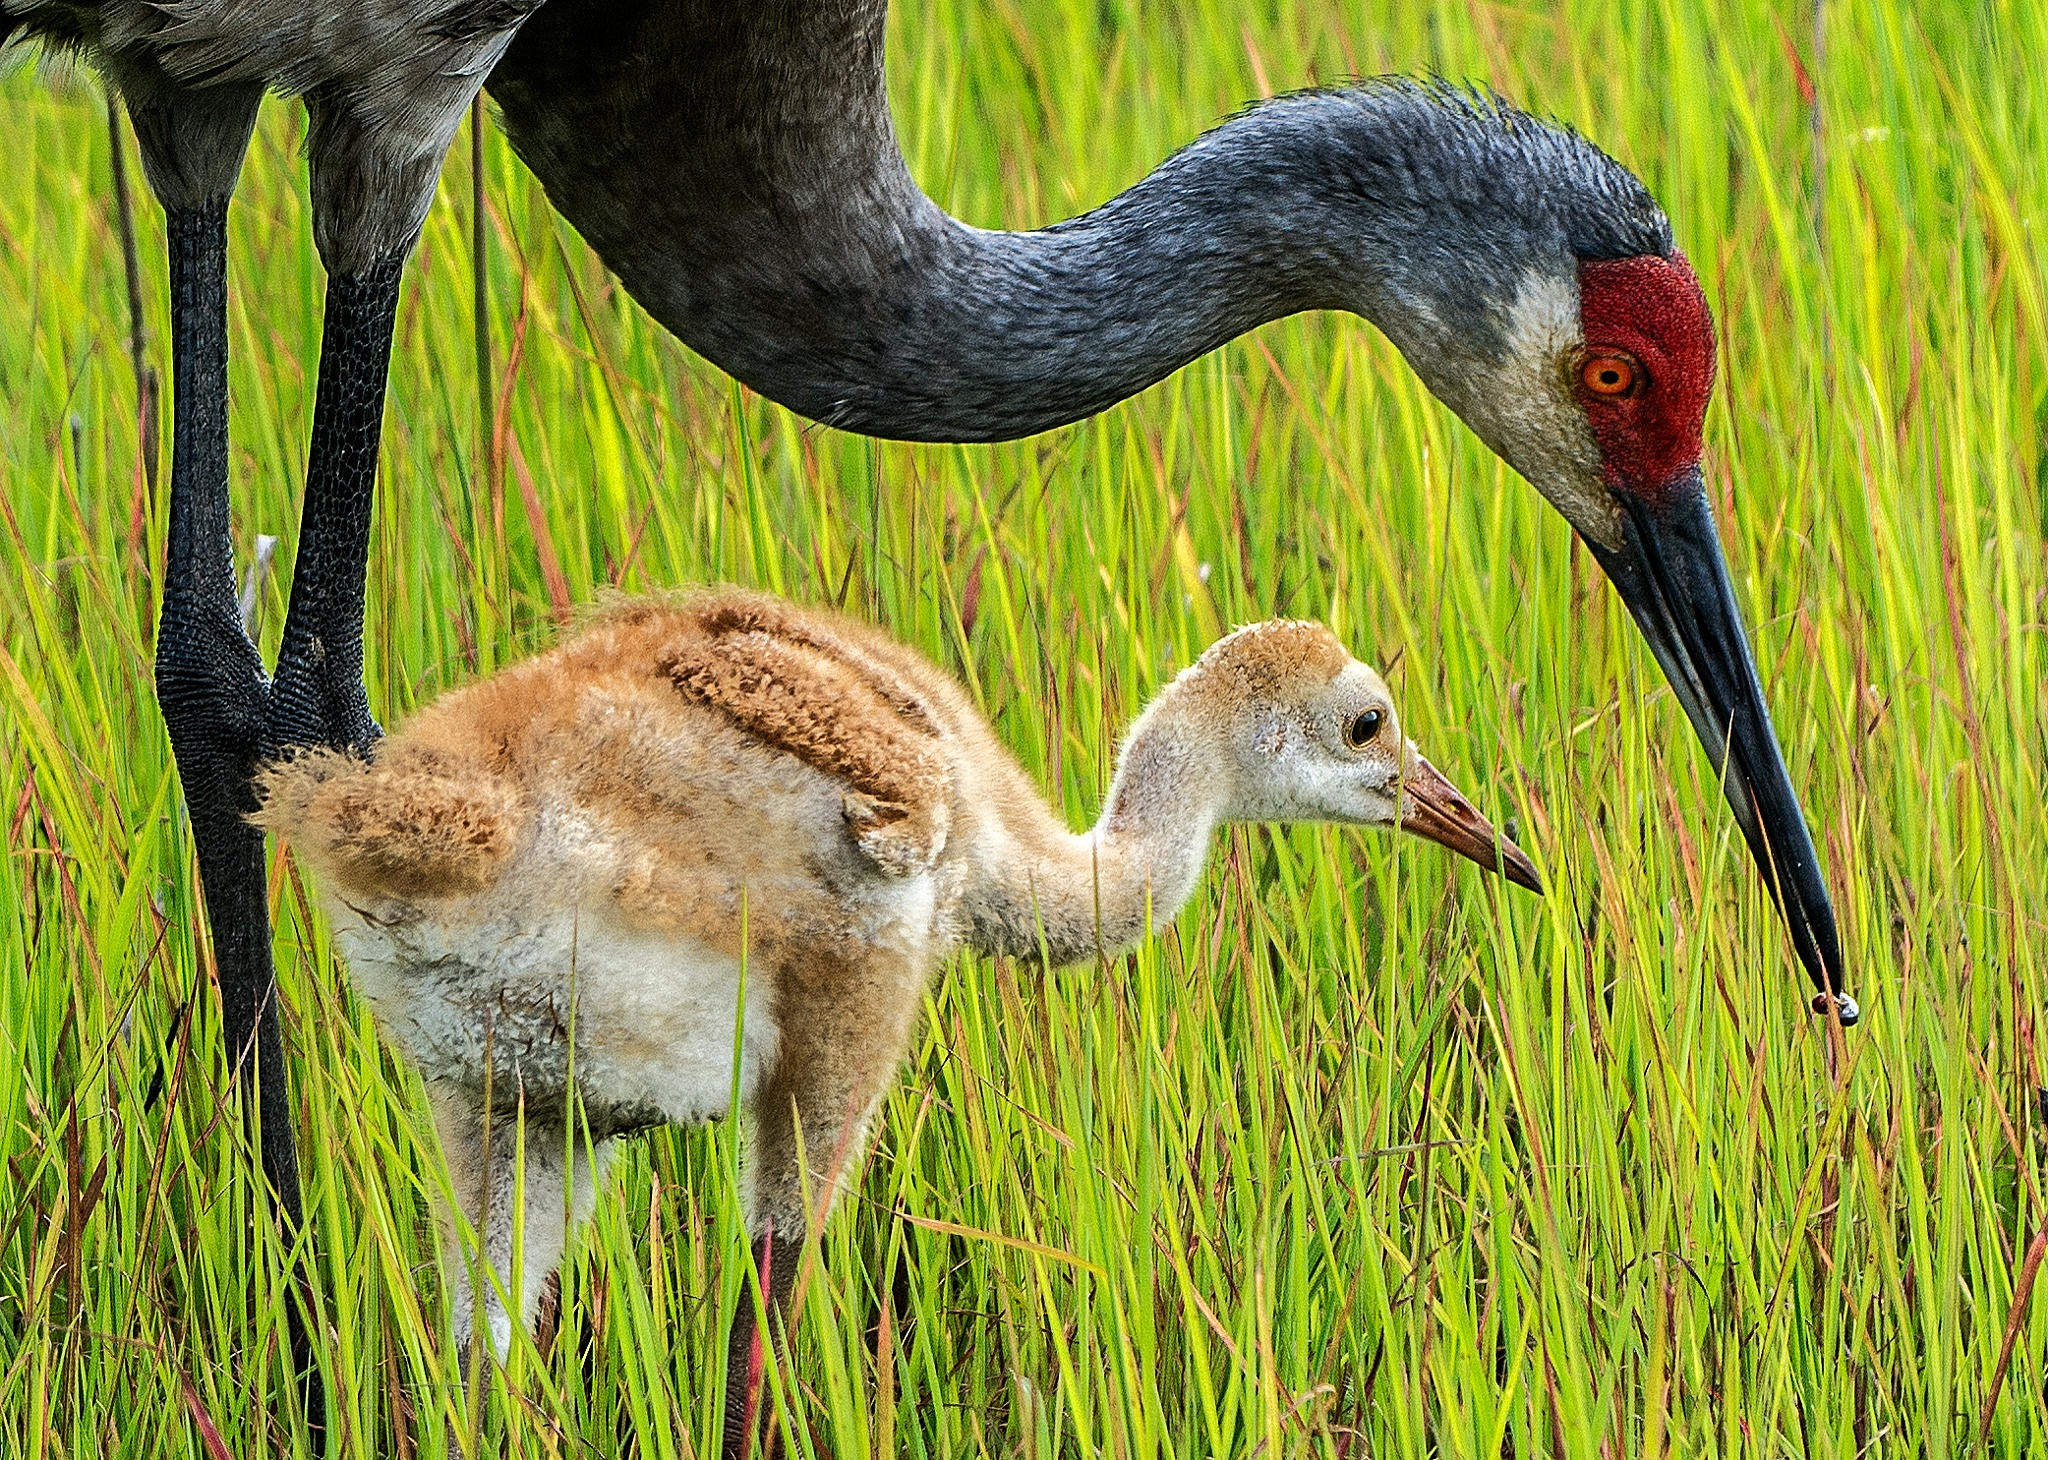 Mother and chick by Joe Saladino